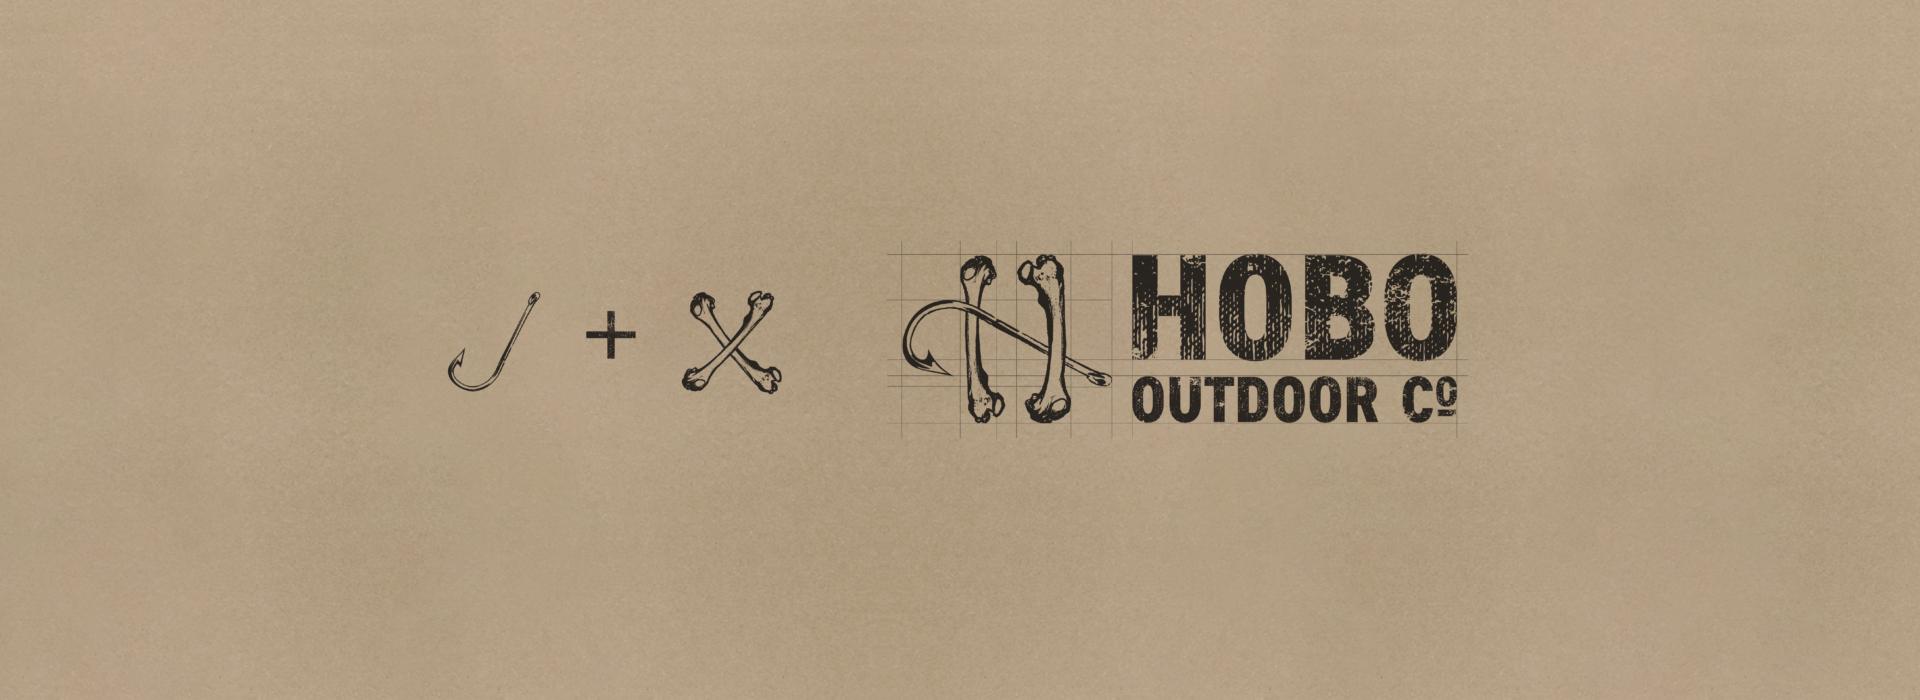 Hobo Outdoor Co.   Logo   Branding   The Underground Design Studio